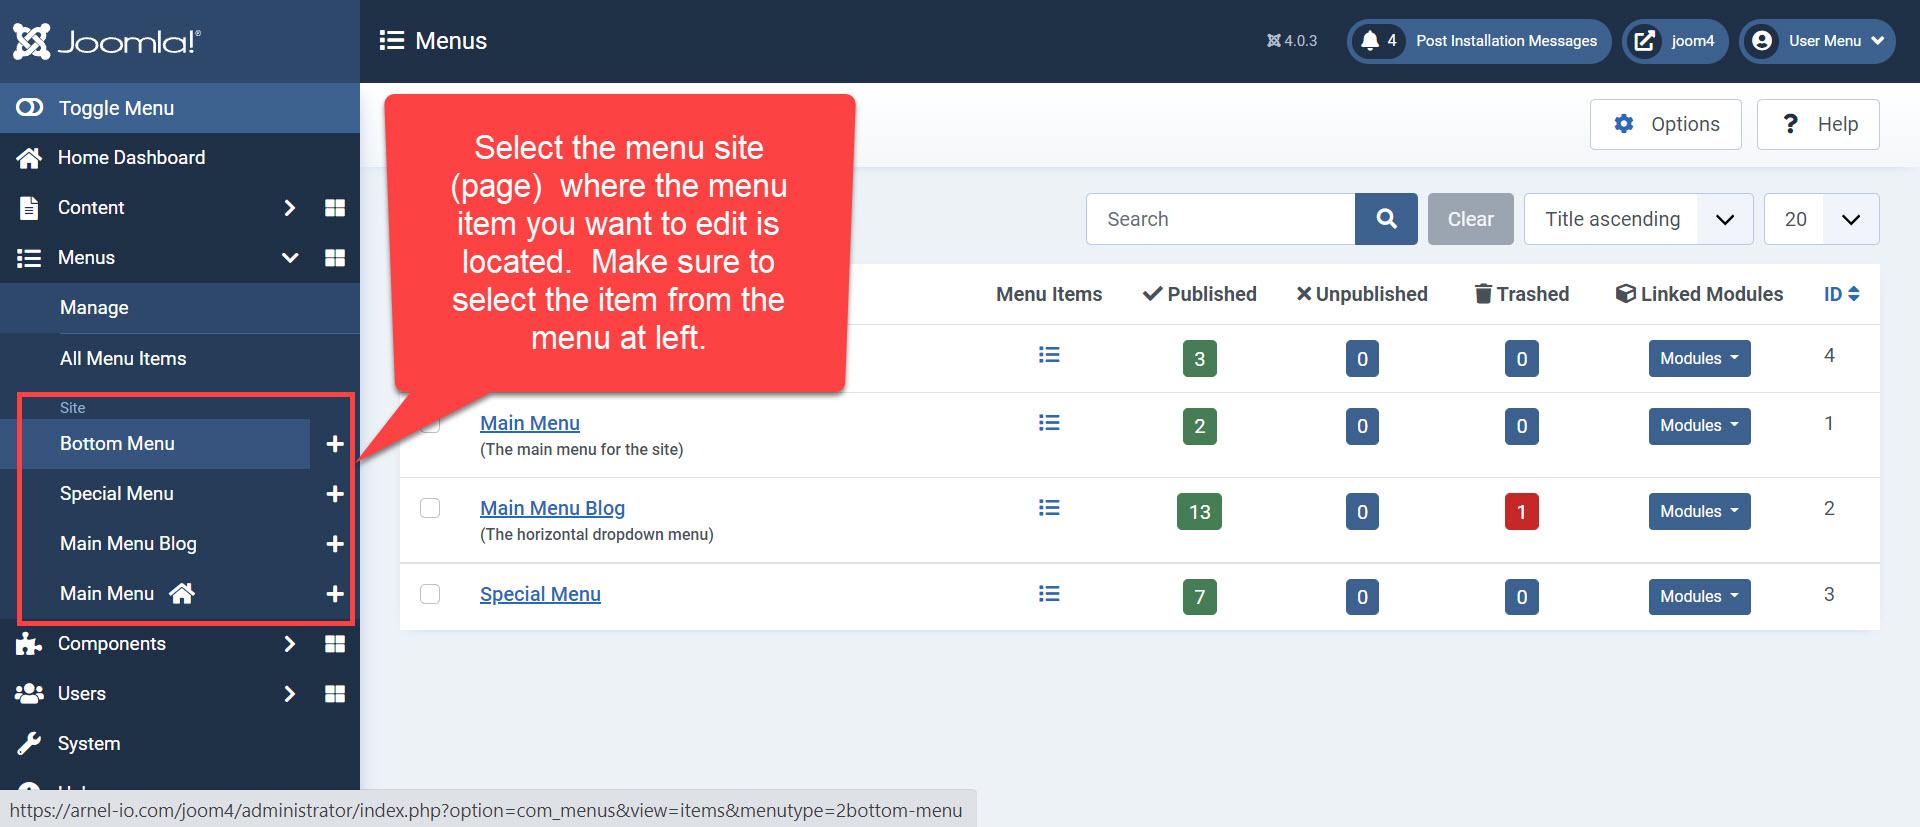 Select menu site - Joomla 4.0